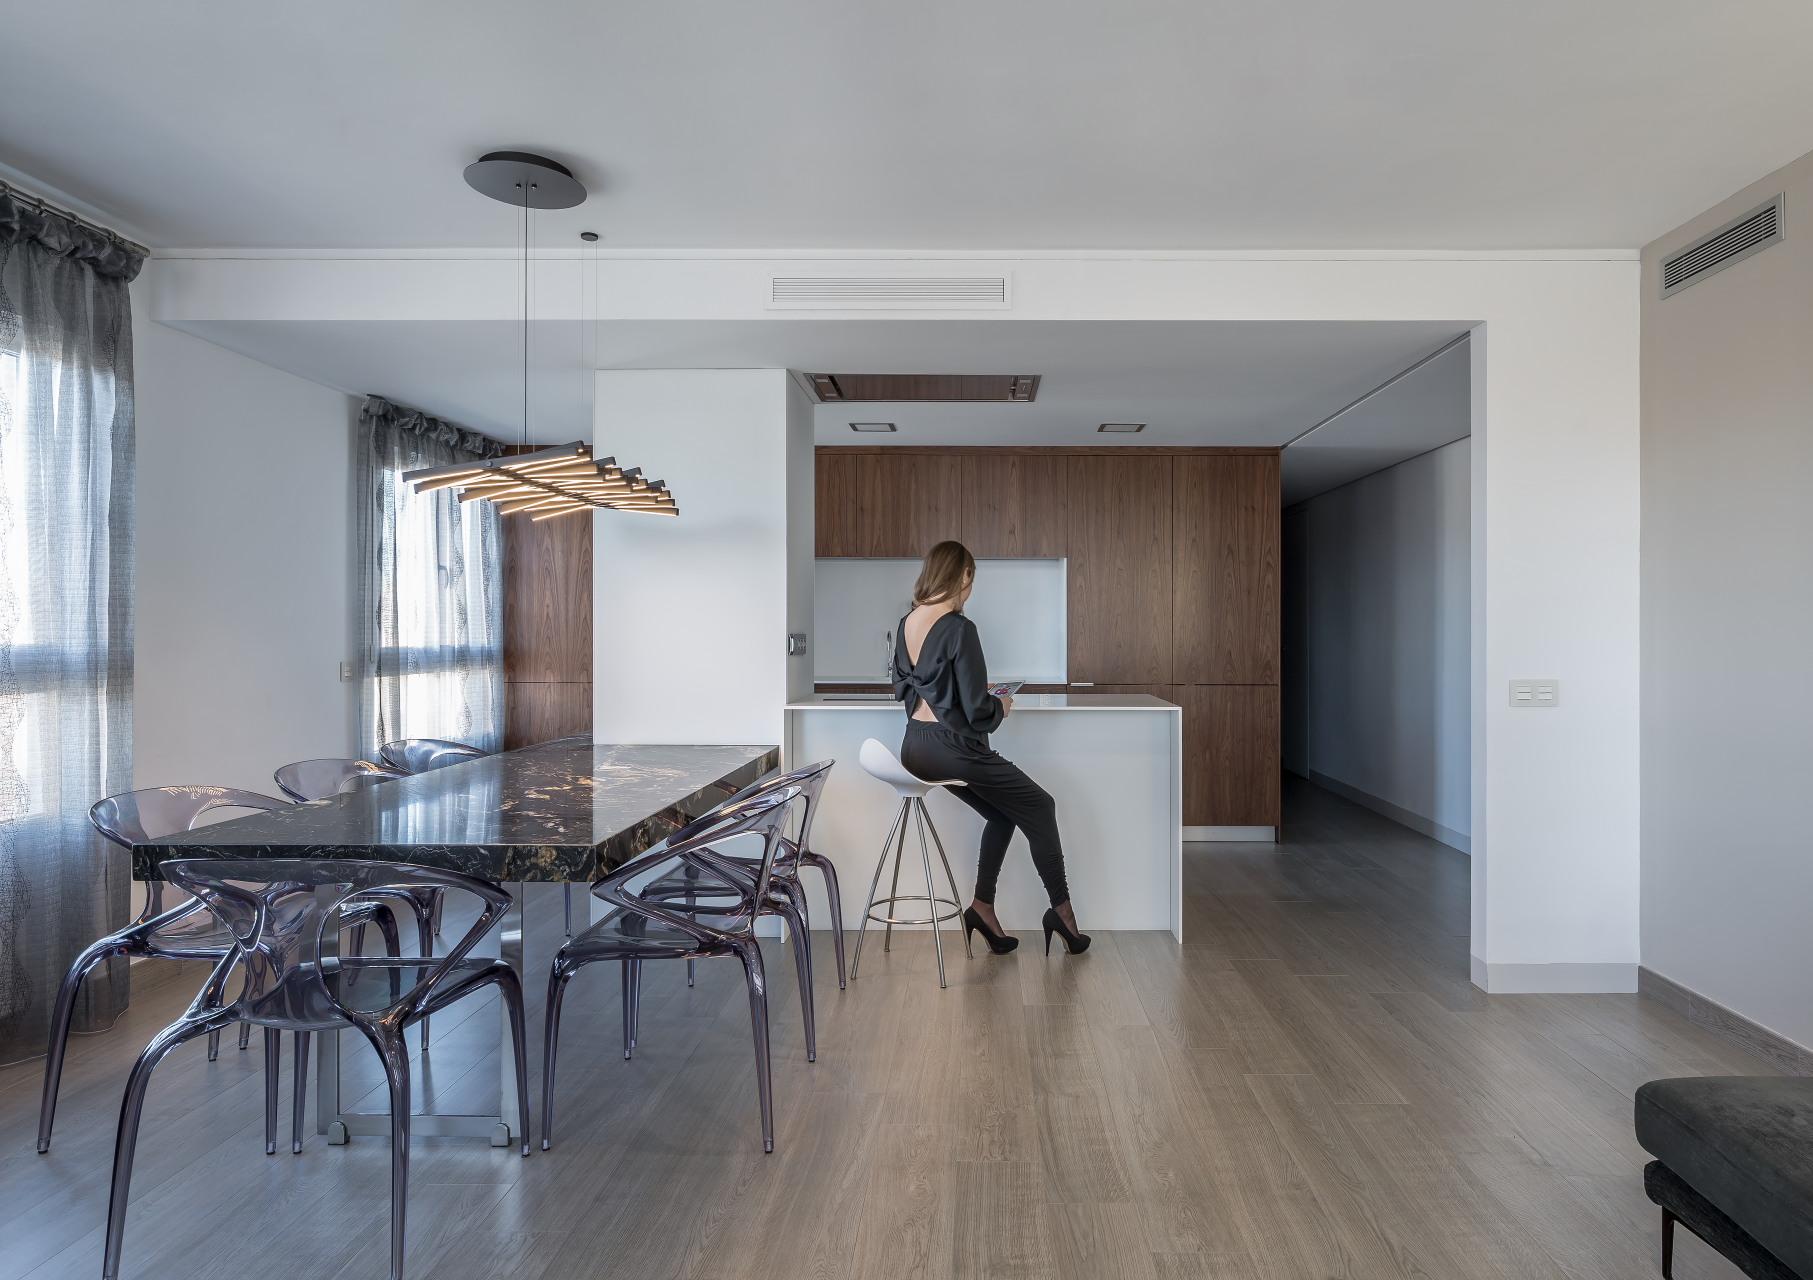 fotografia-arquitectura-valencia-german-cabo-lliberos-cortes (3)